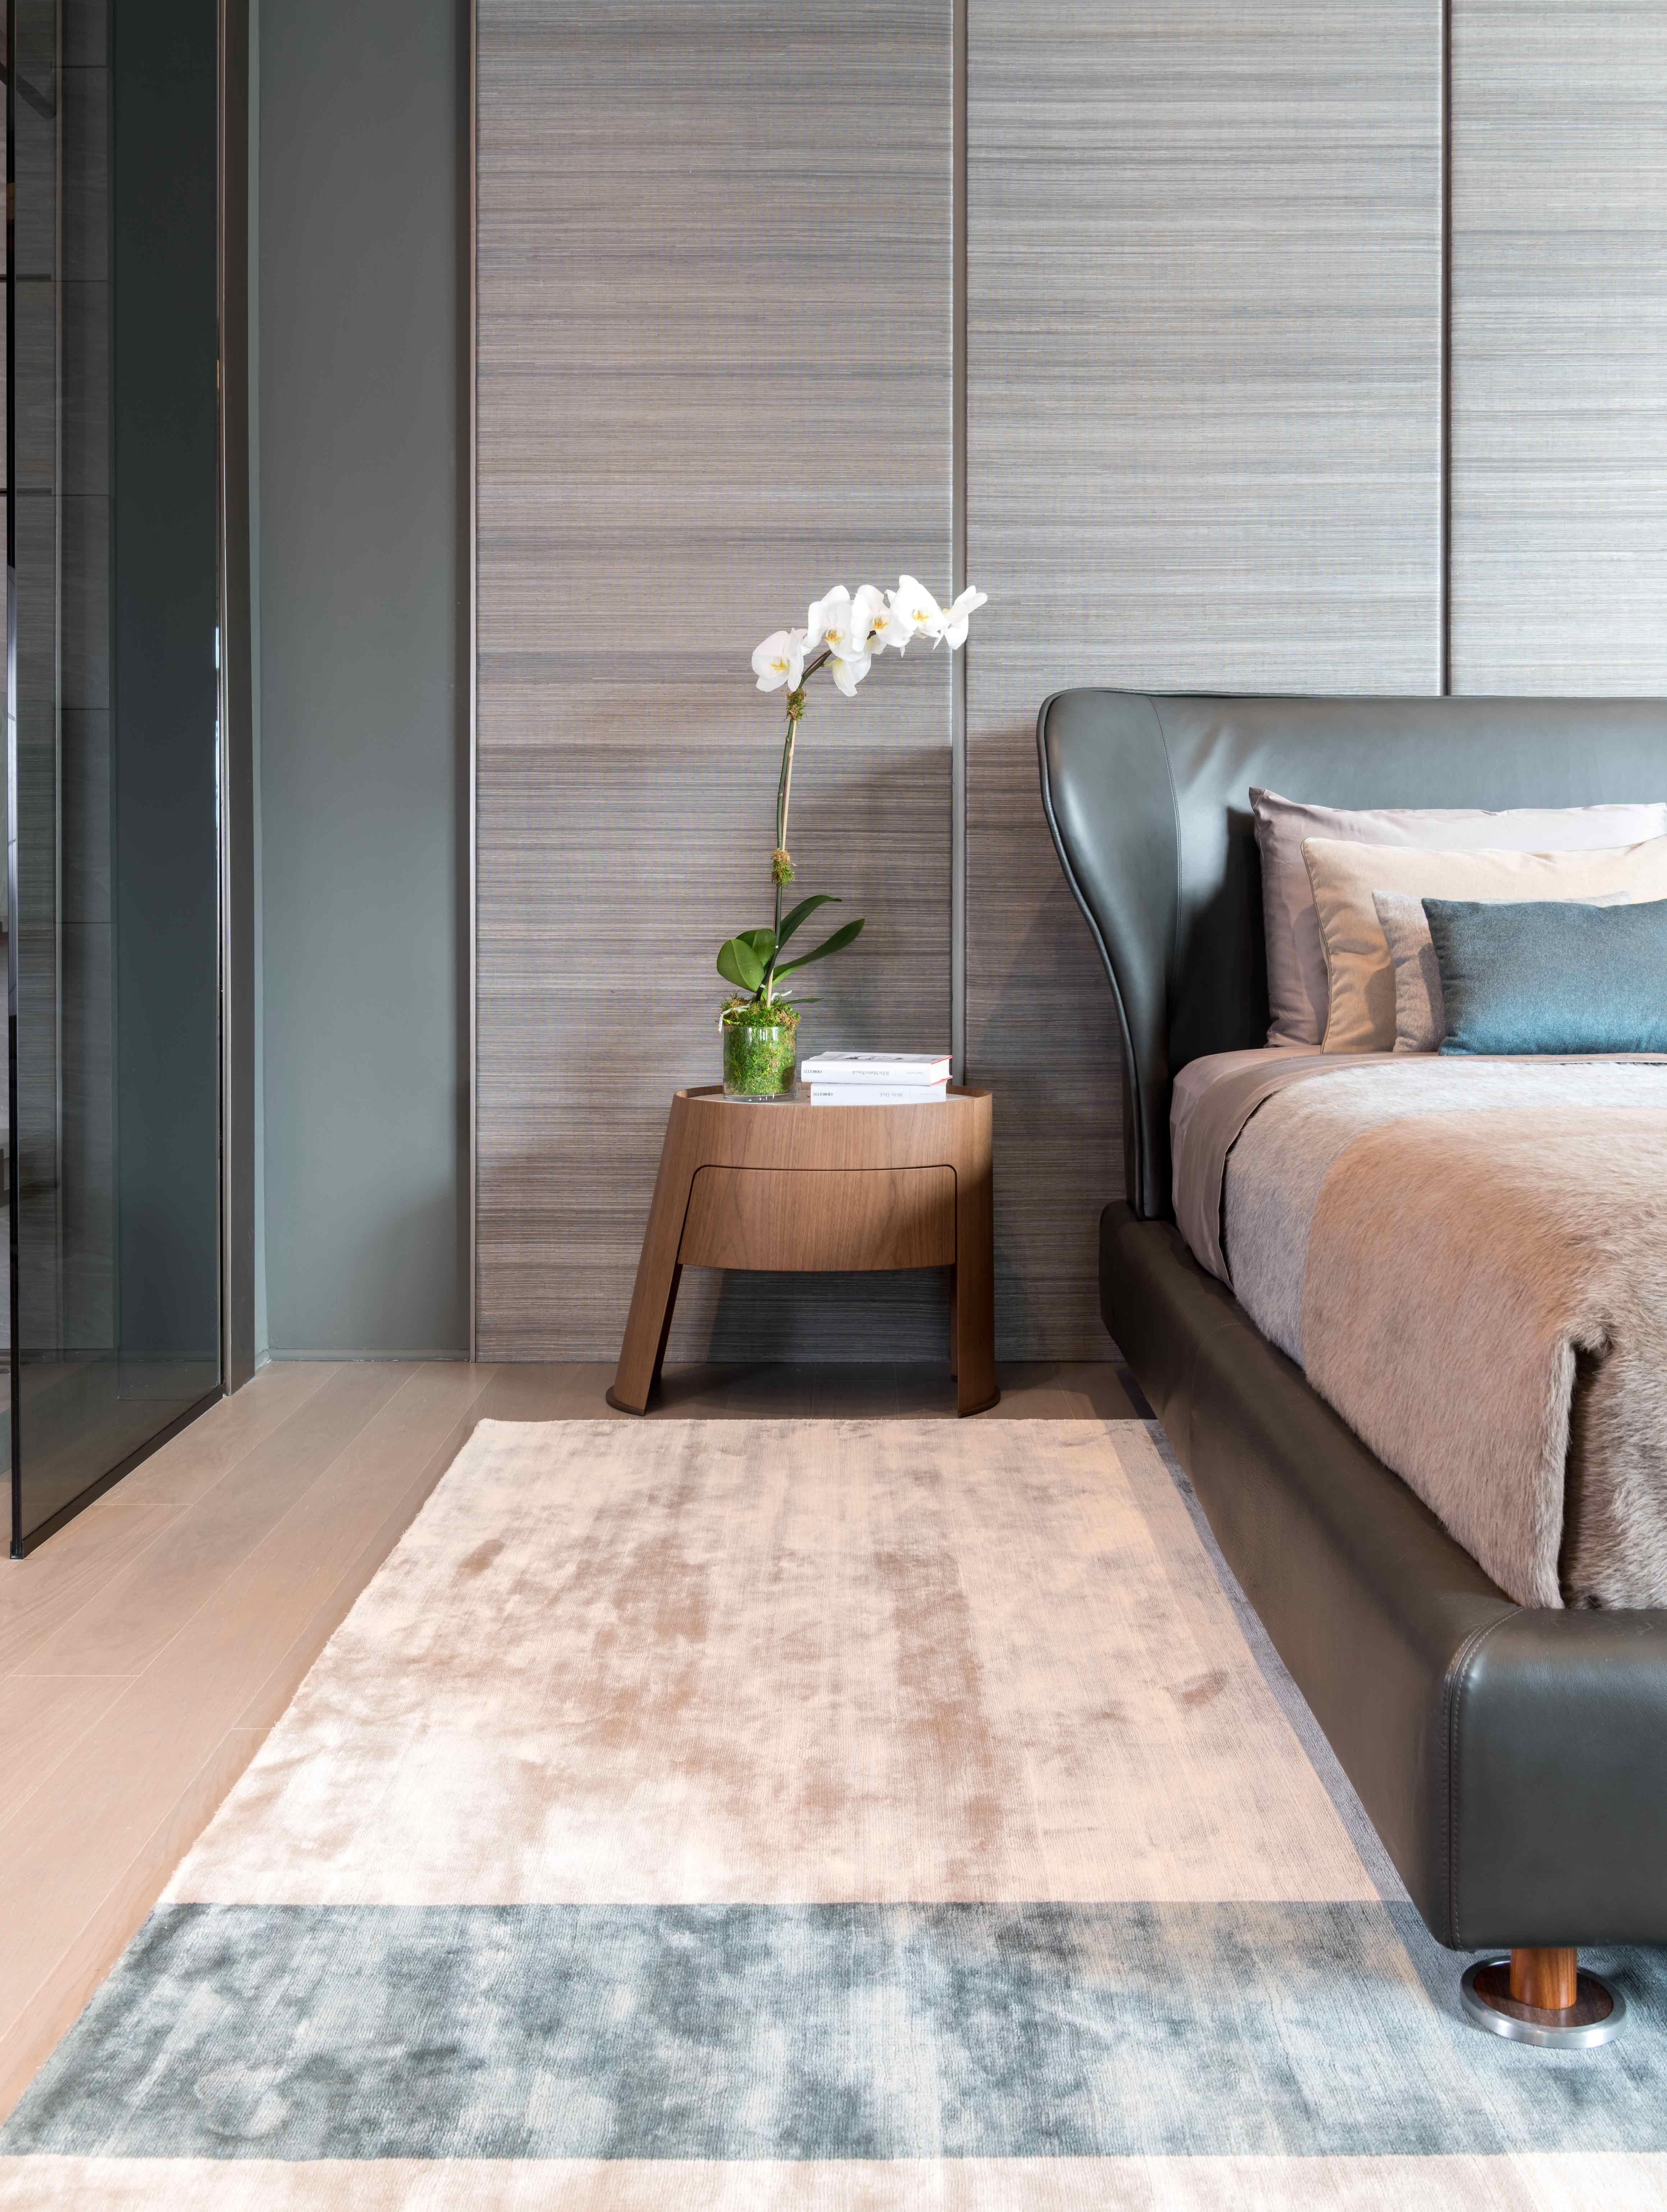 Giorgetti store houston interior design luxury also rh in pinterest